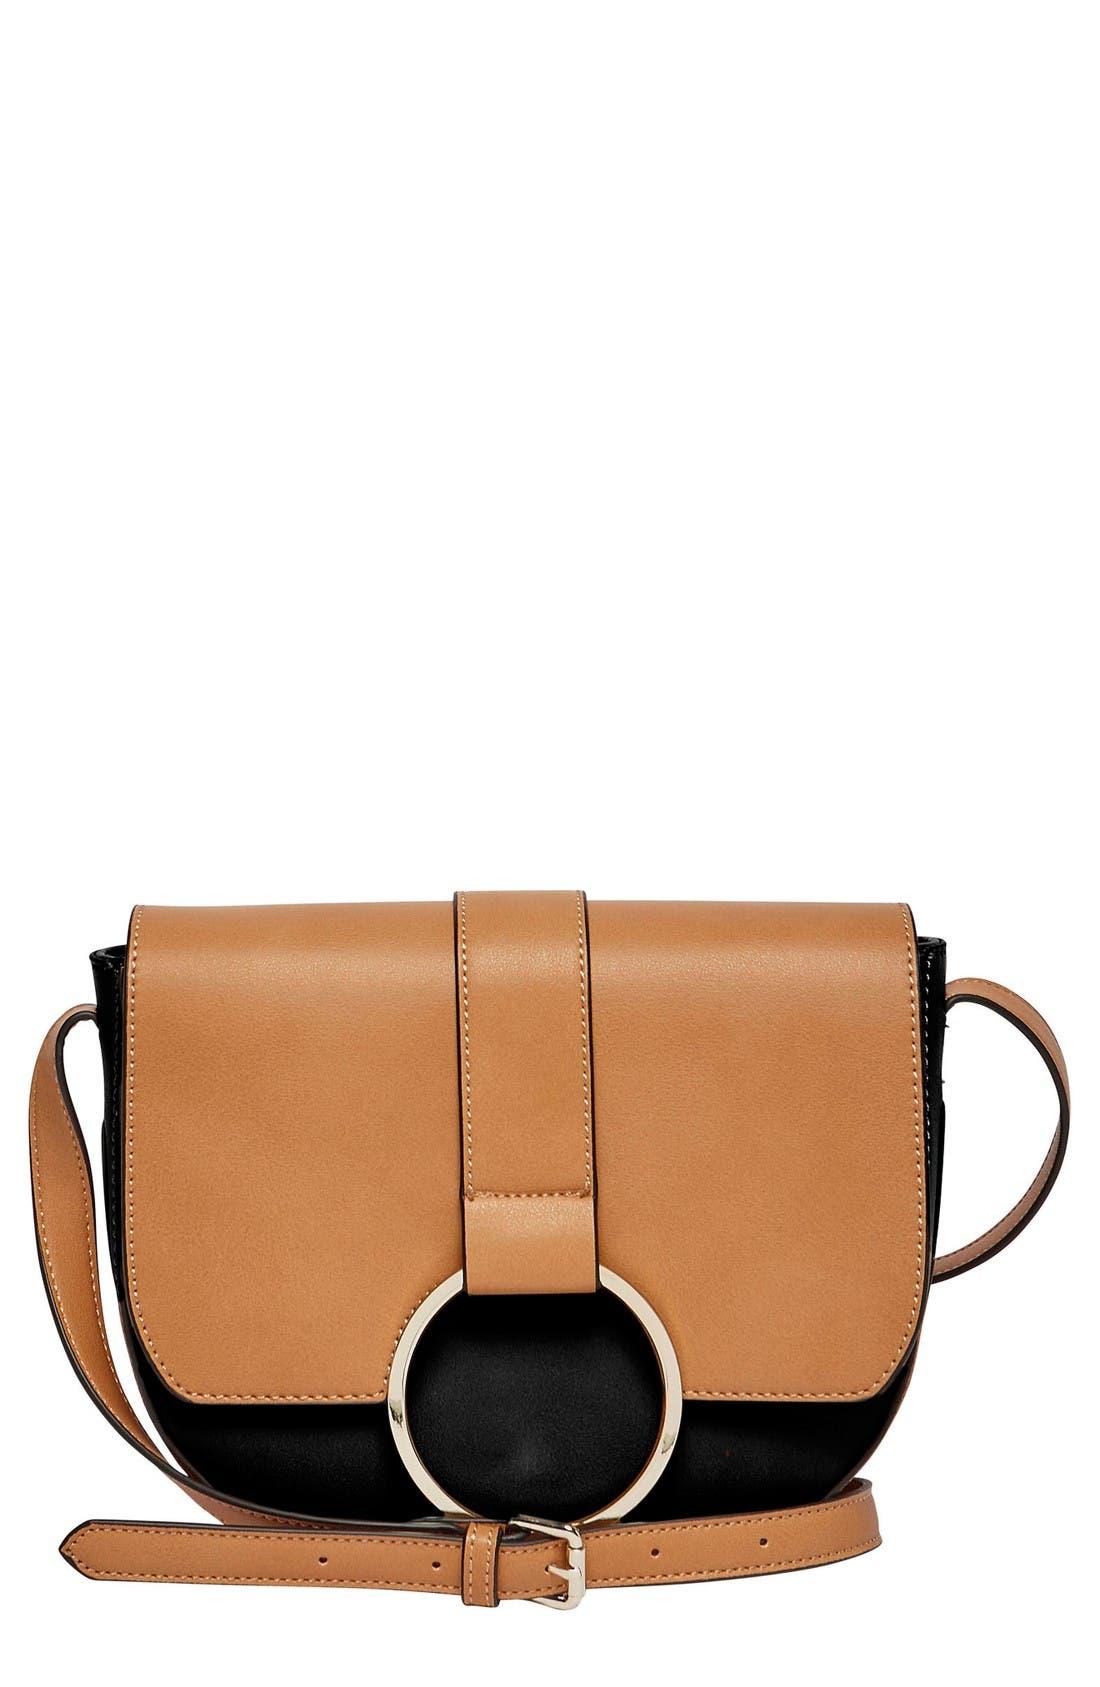 Main Image - Urban Originals Reckless Destiny Vegan Leather Saddle Bag